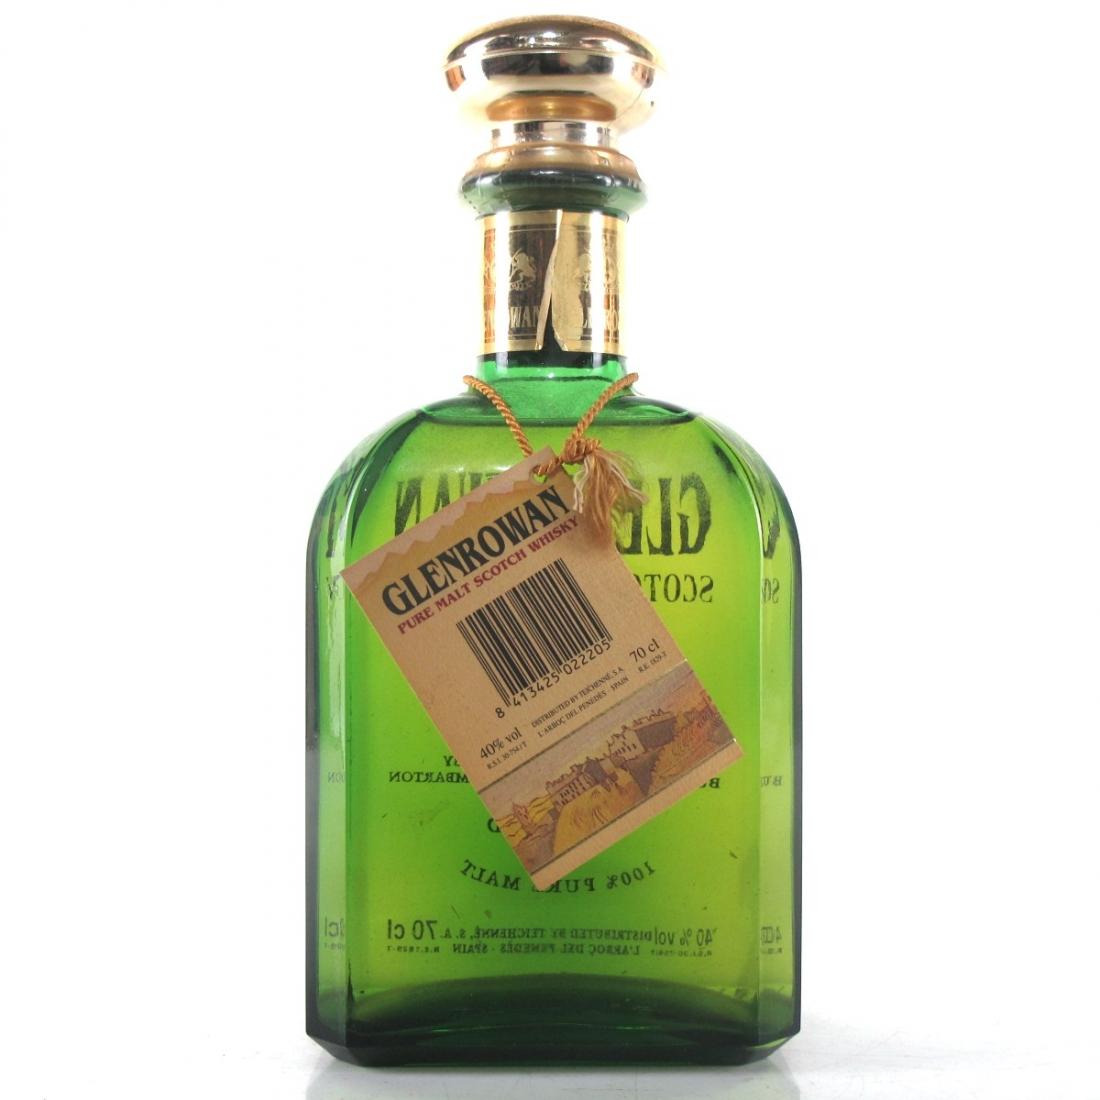 Glenrowan Pure Malt Scotch Whisky